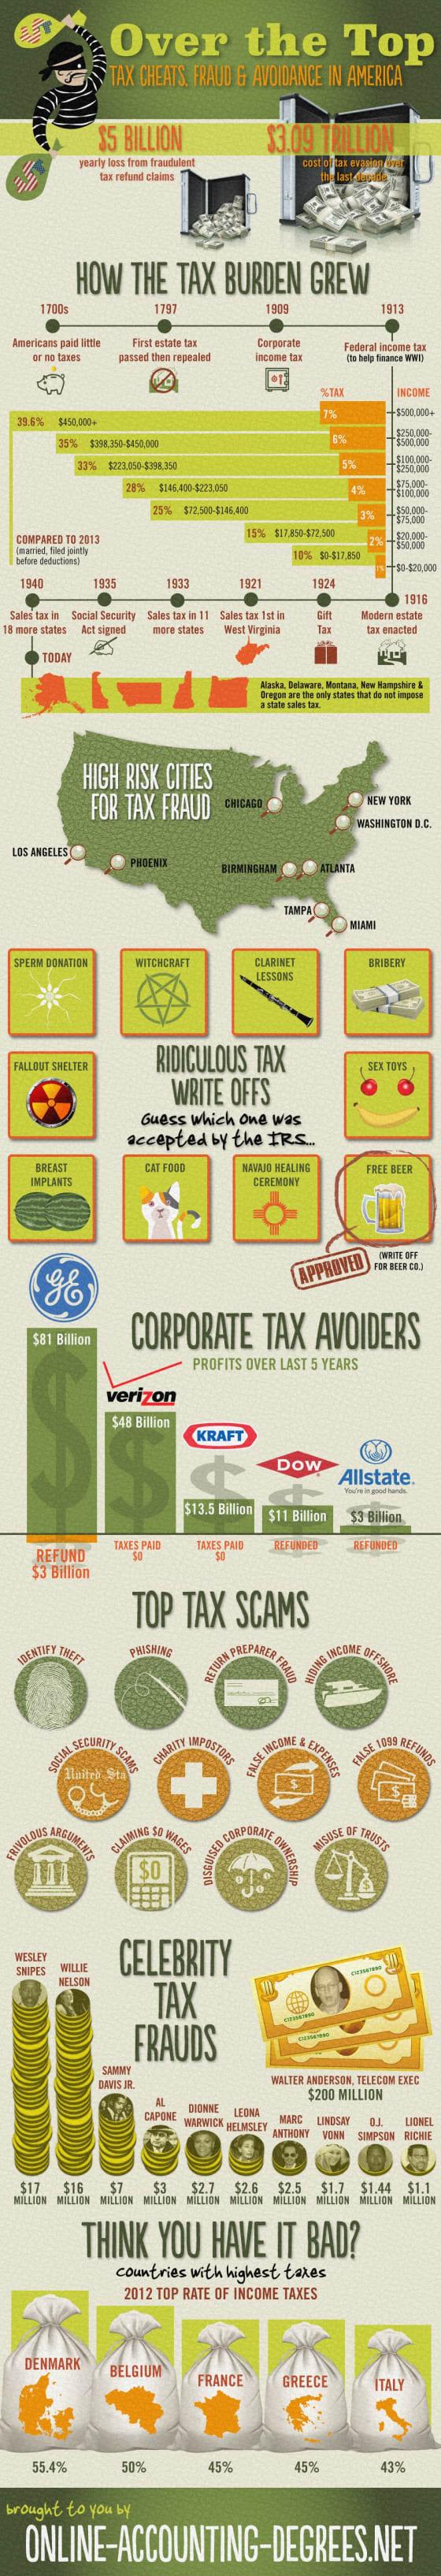 GreatTax-fraud